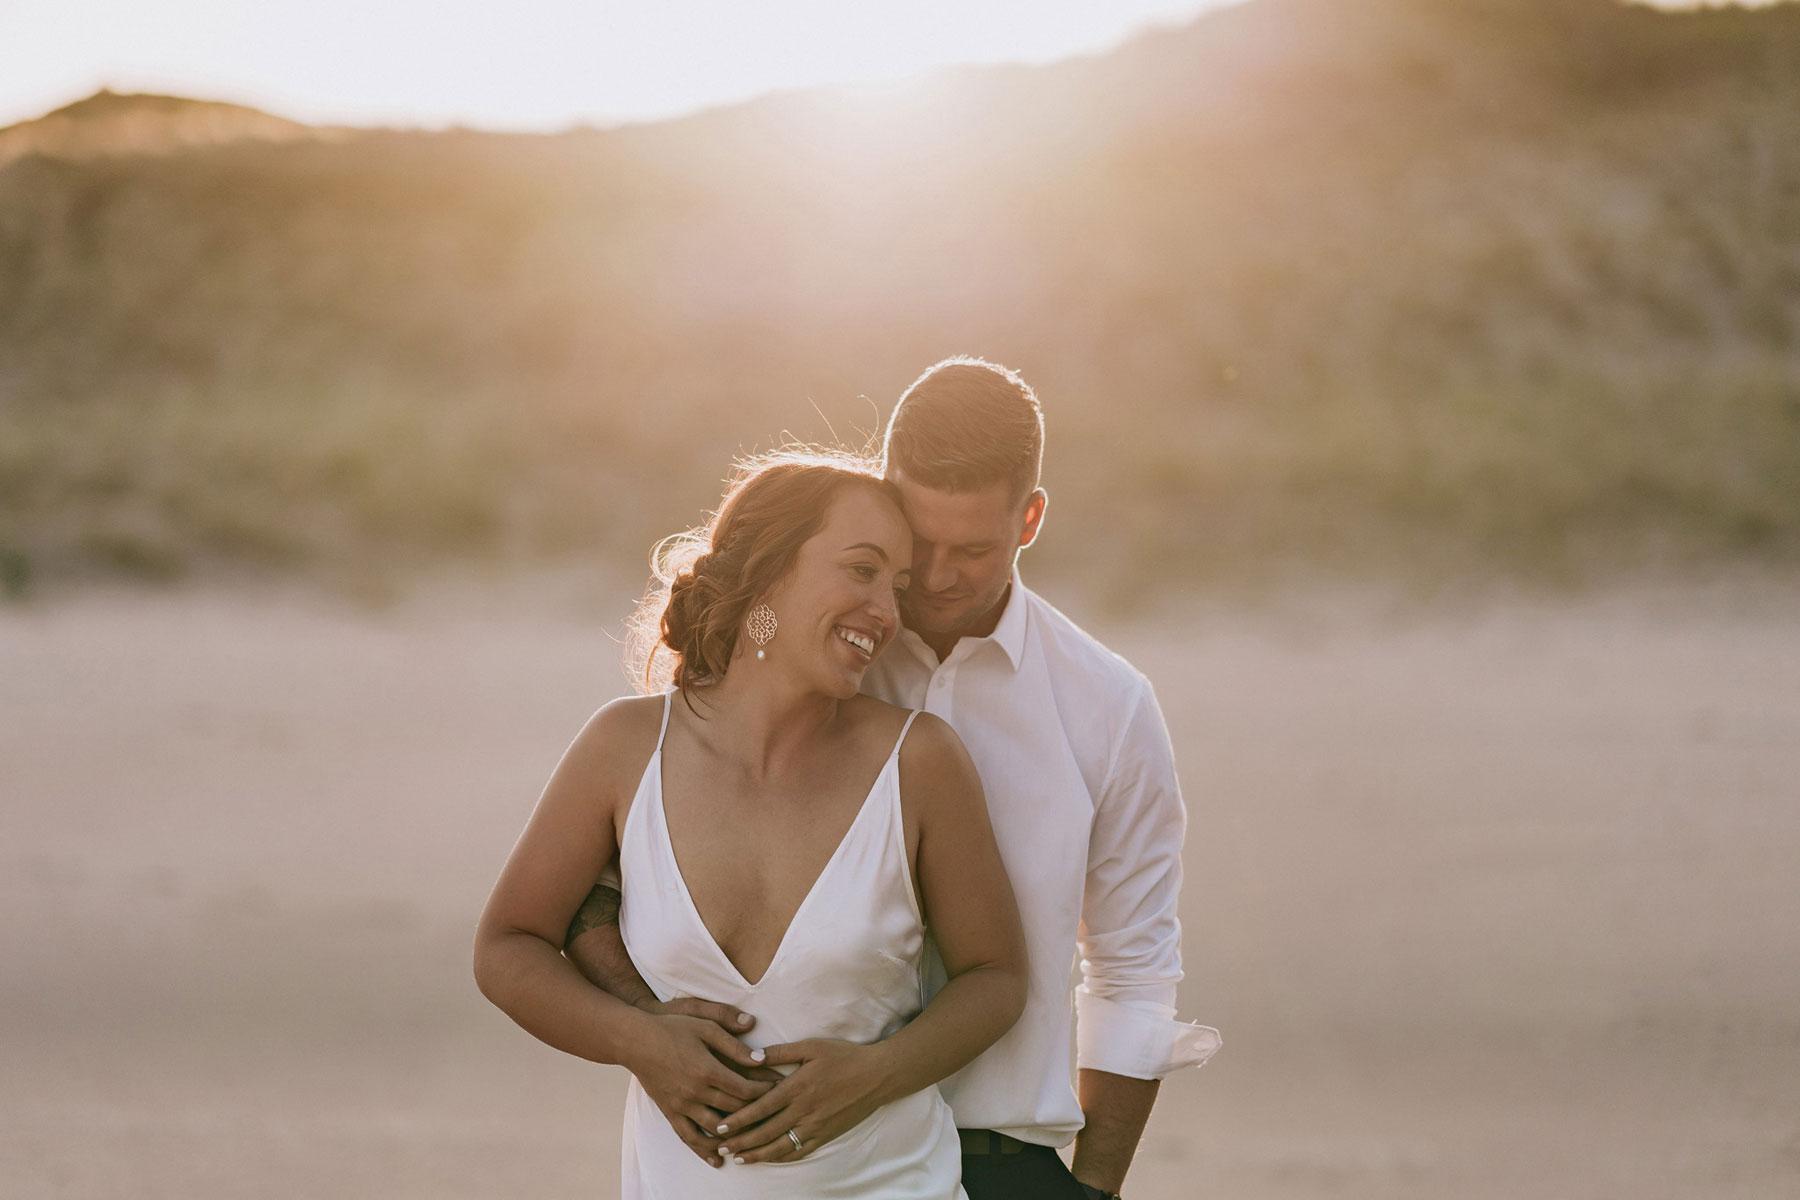 newfound-j-n-orua-beach-house-coromandel-wedding-photographers-741